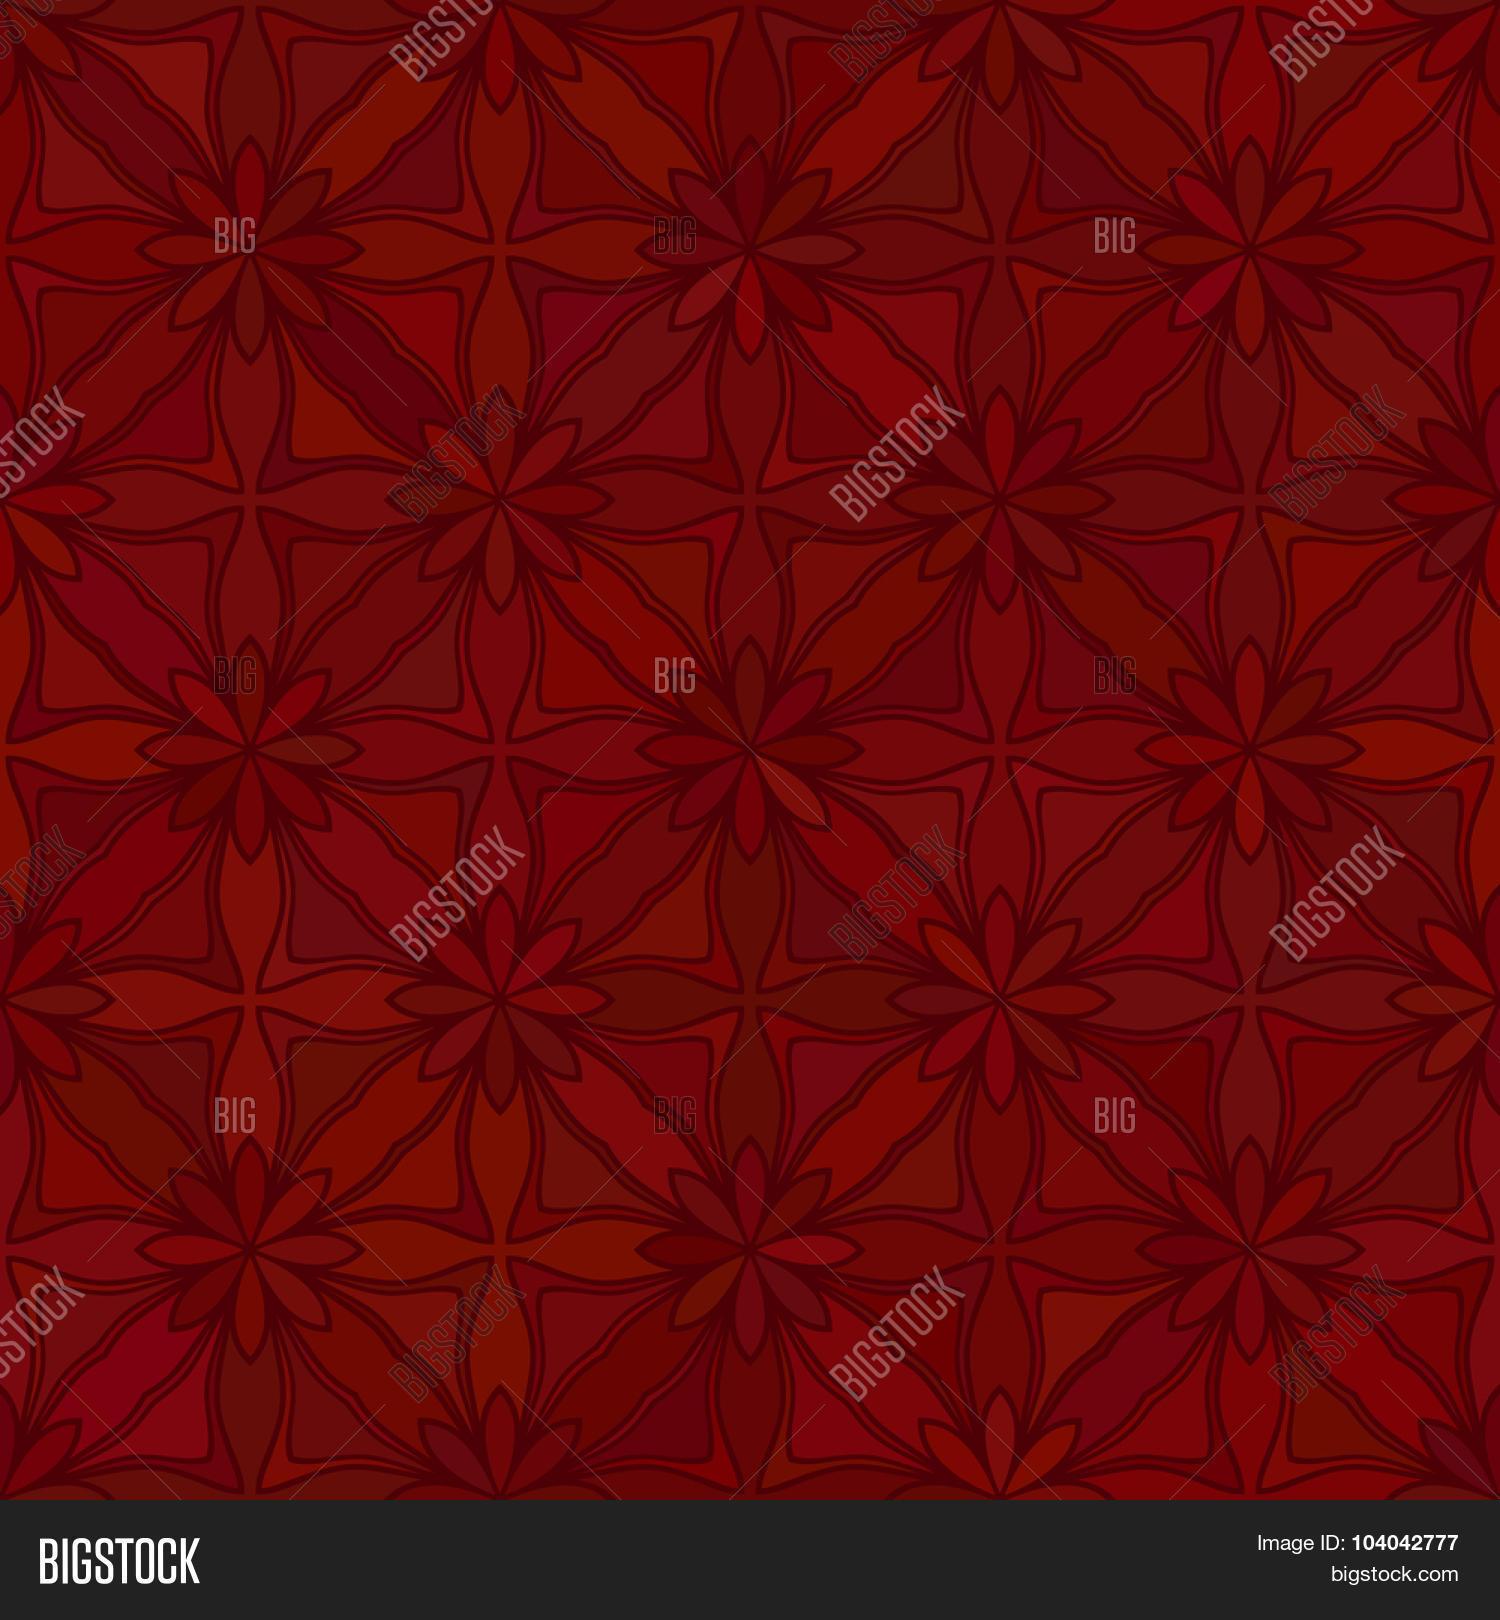 Abstract Vector Vector Photo Free Trial Bigstock